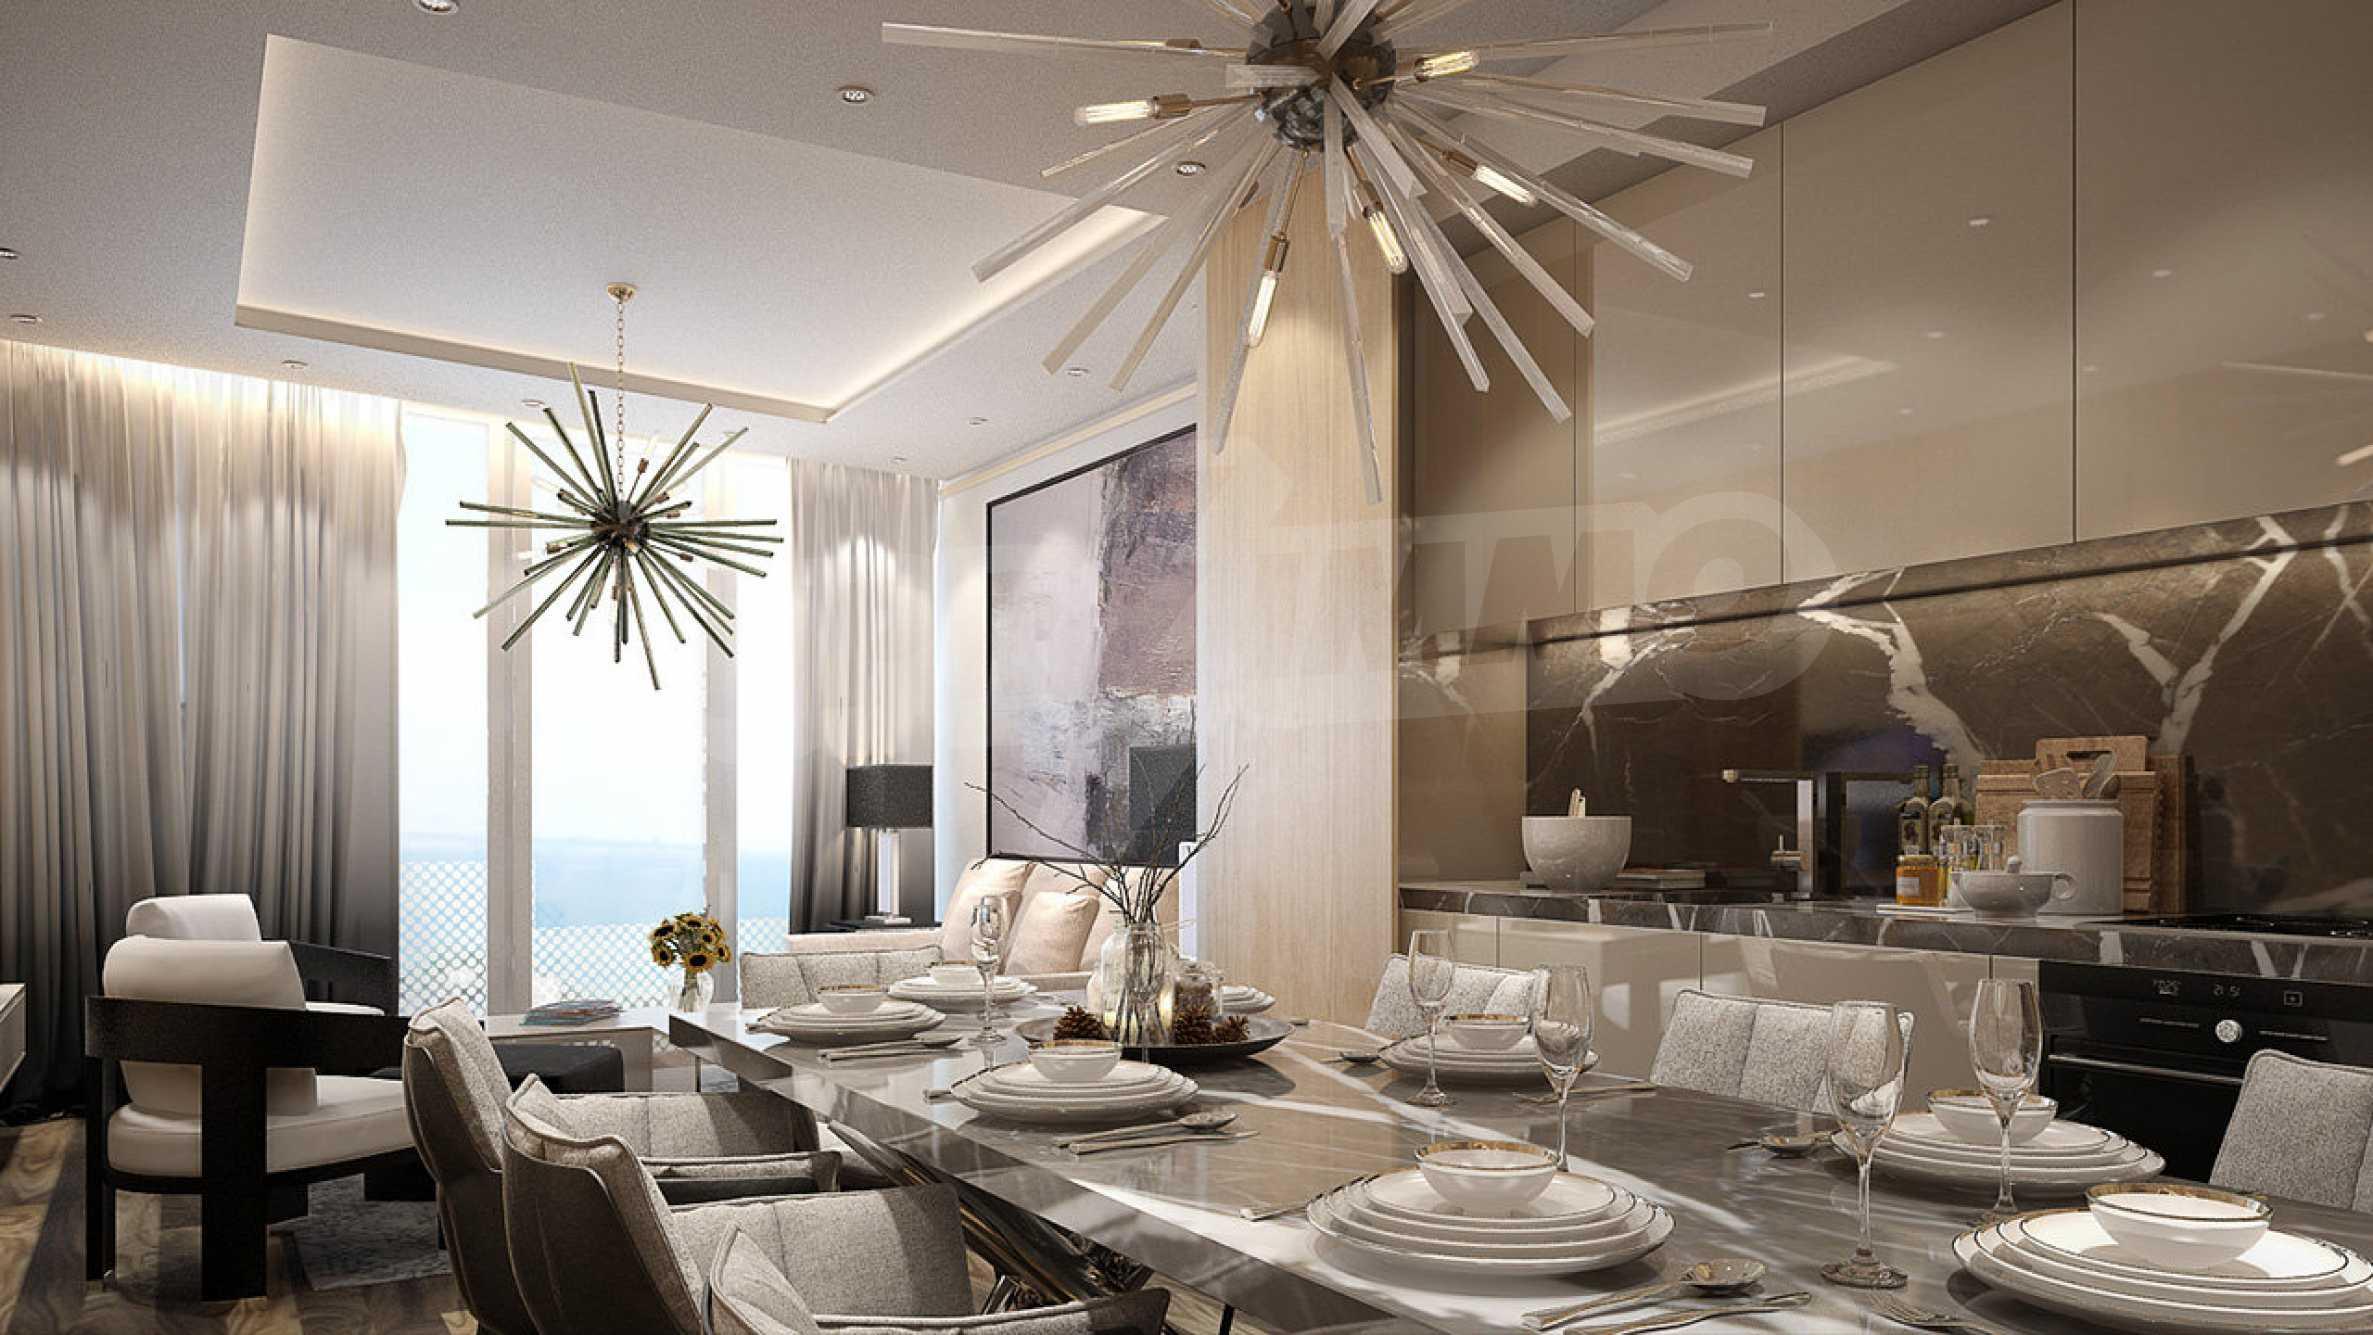 Нова сграда с луксозни апартаменти в гр. Бургас 54